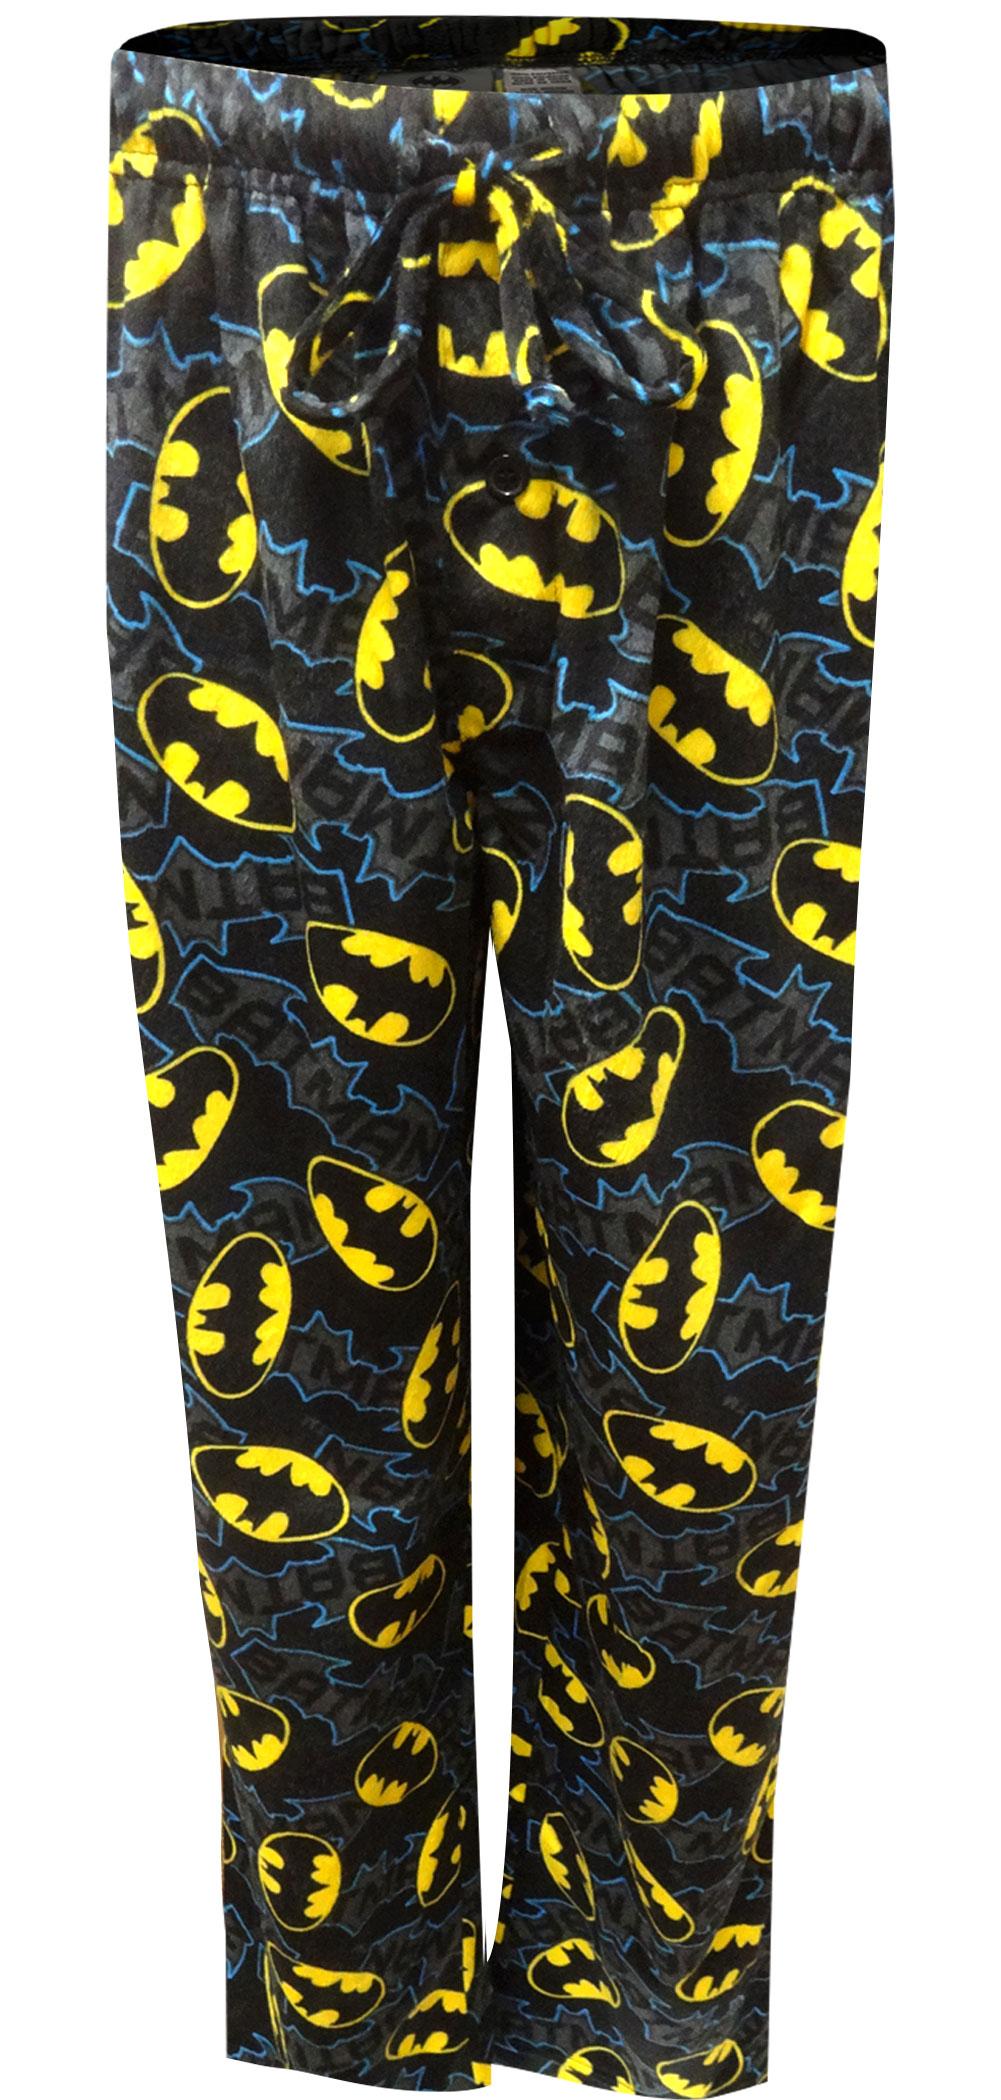 Image of Batman Logo Minky Soft Cozy Lounge Pants for men